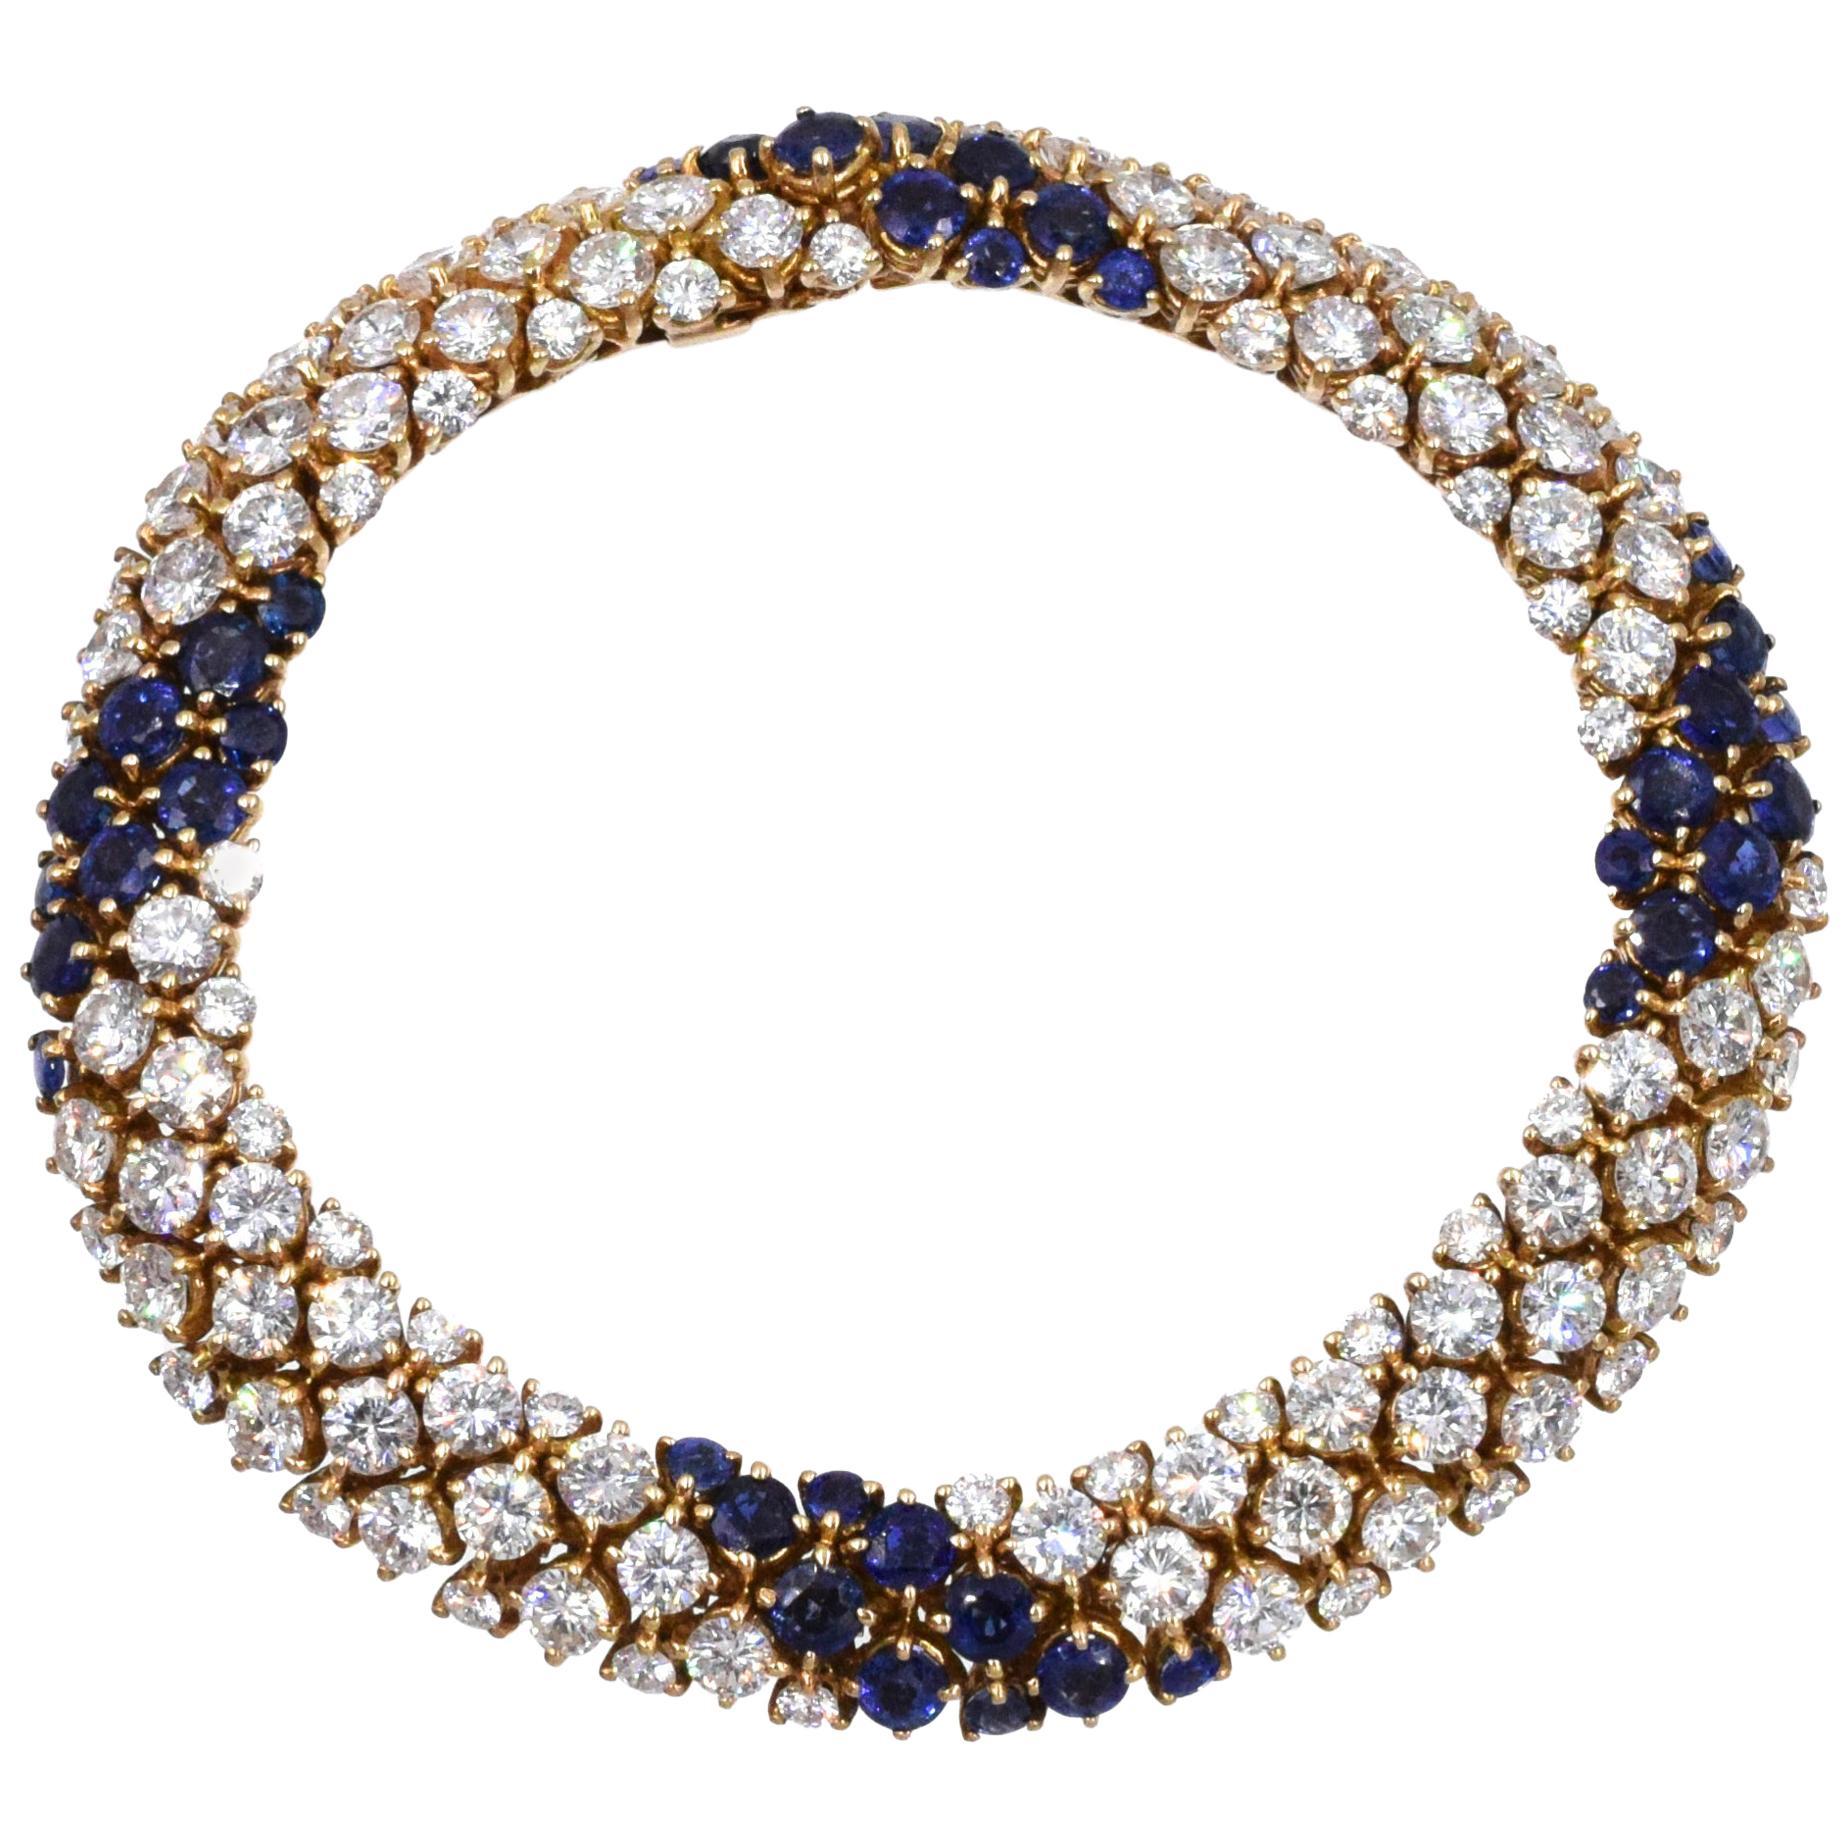 Van Cleef & Arpels 'Pelouse' Bracelet French